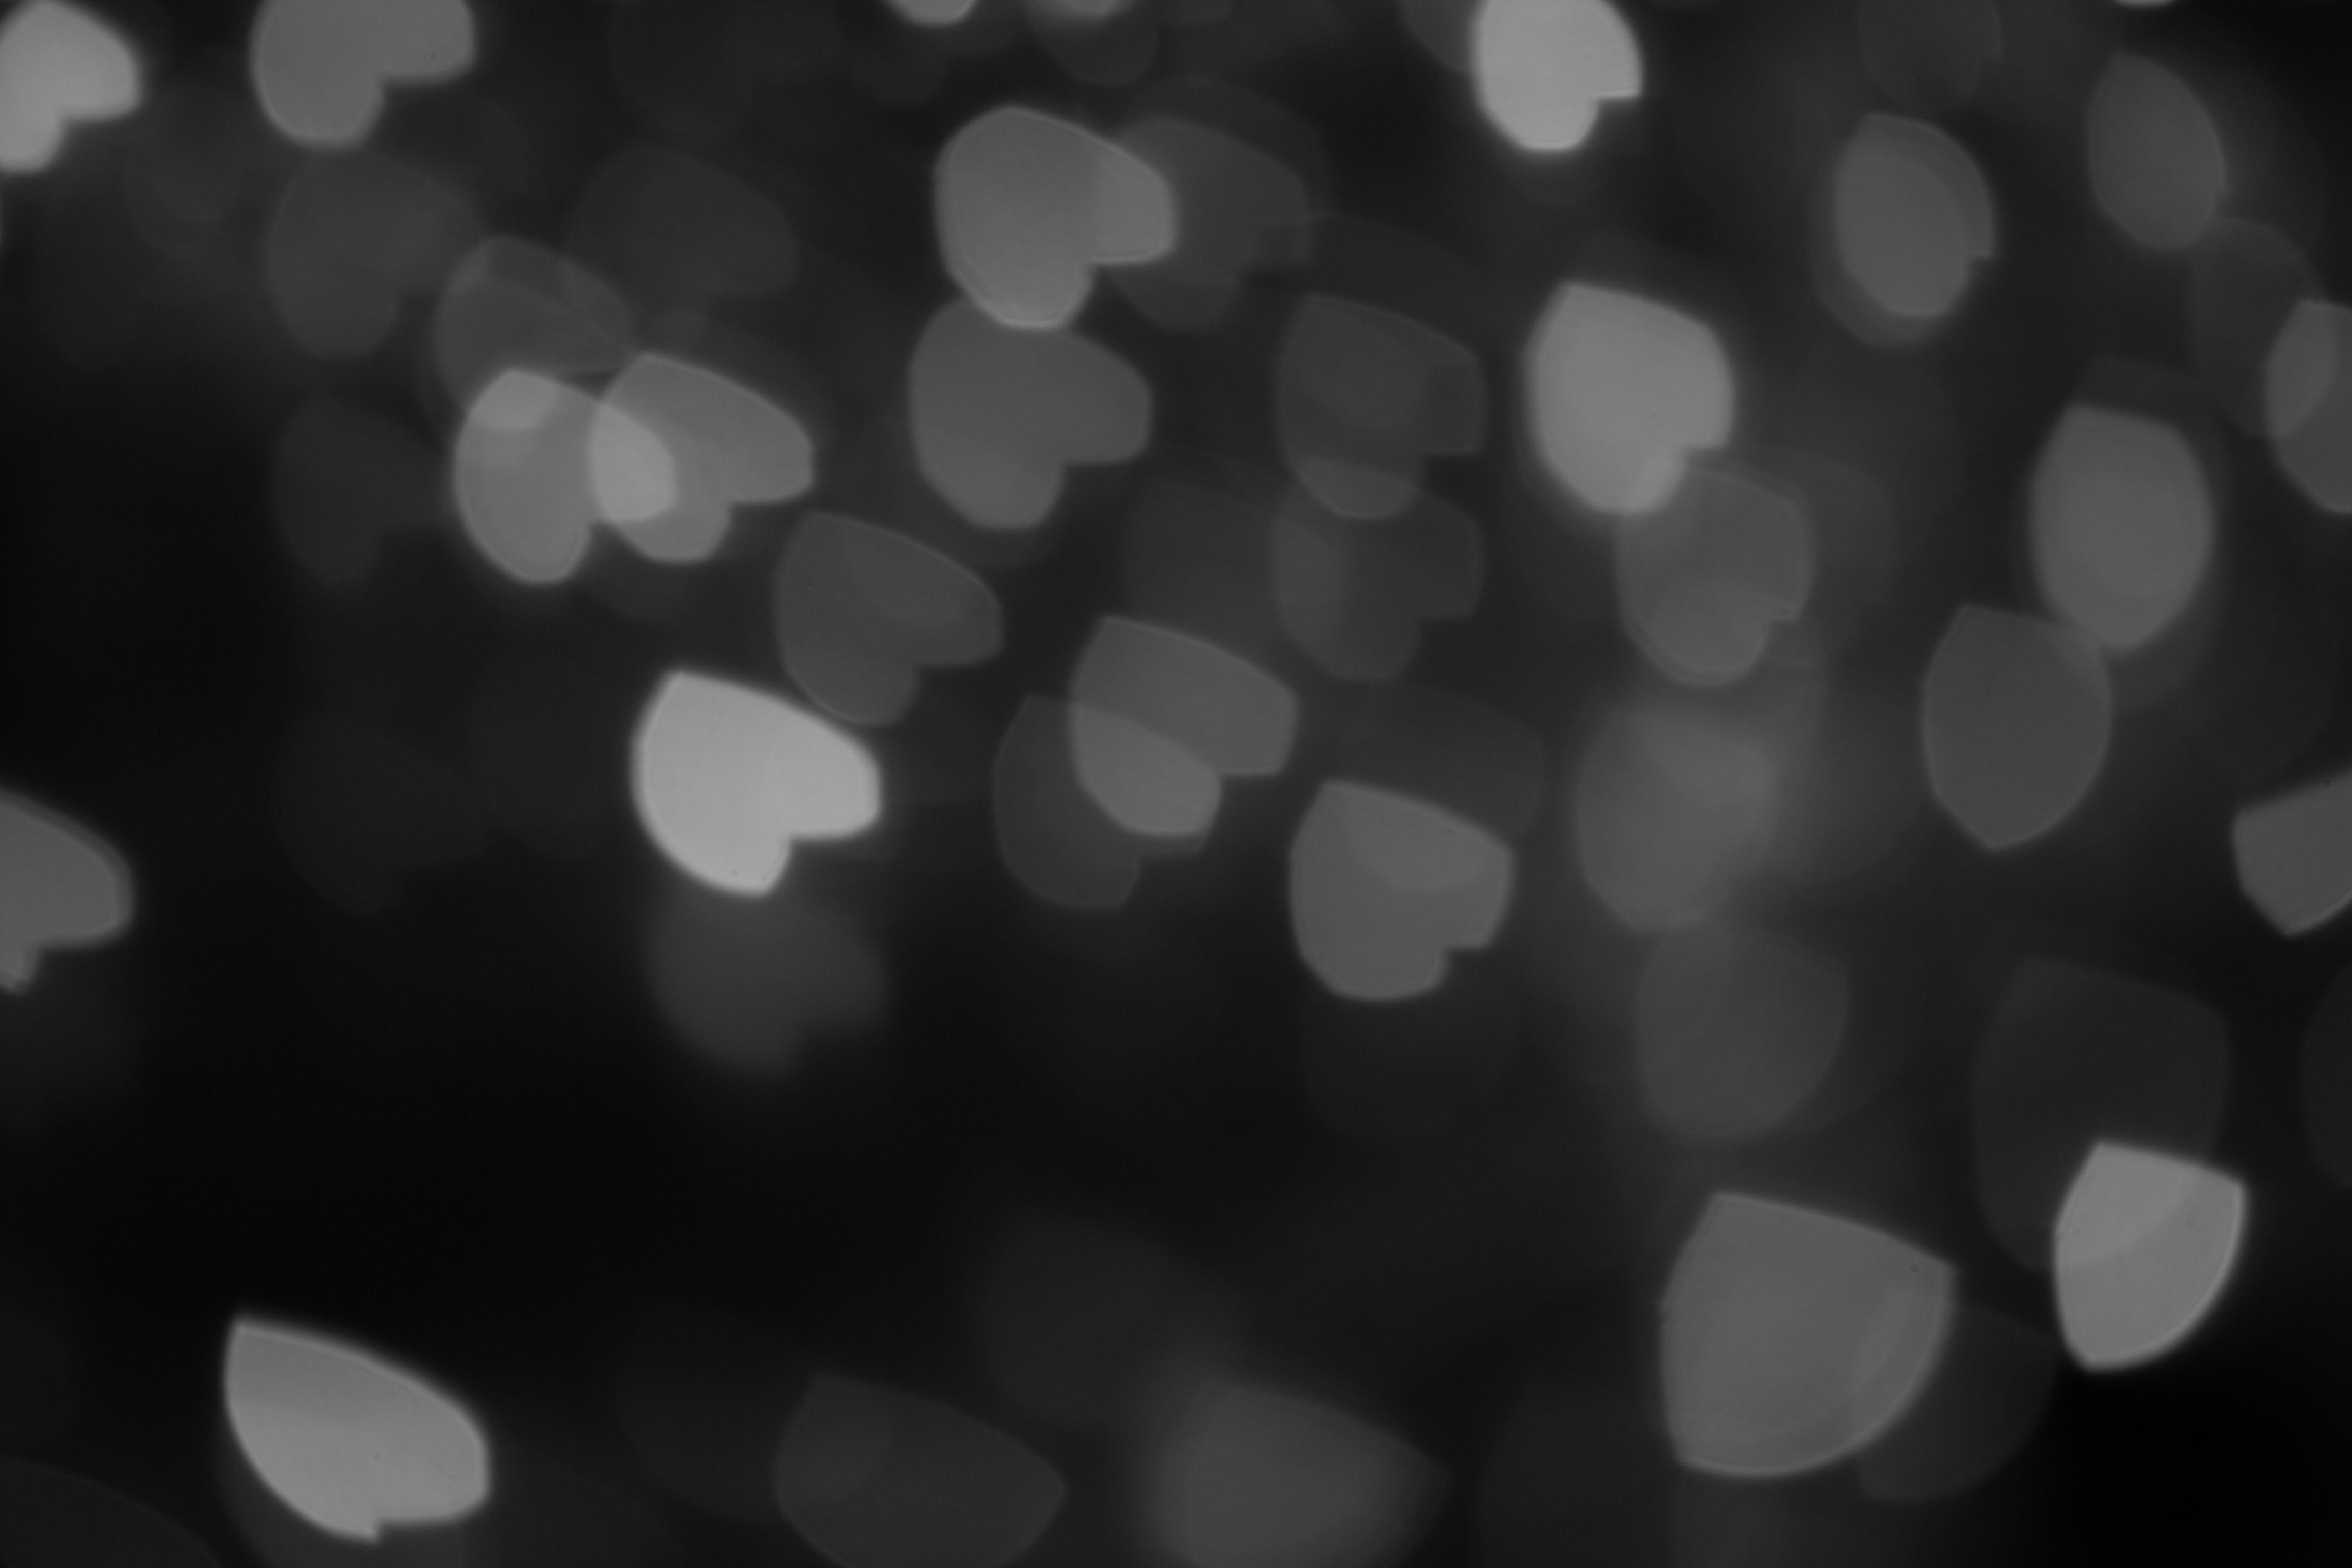 [63+] Black And White Heart Background on WallpaperSafari